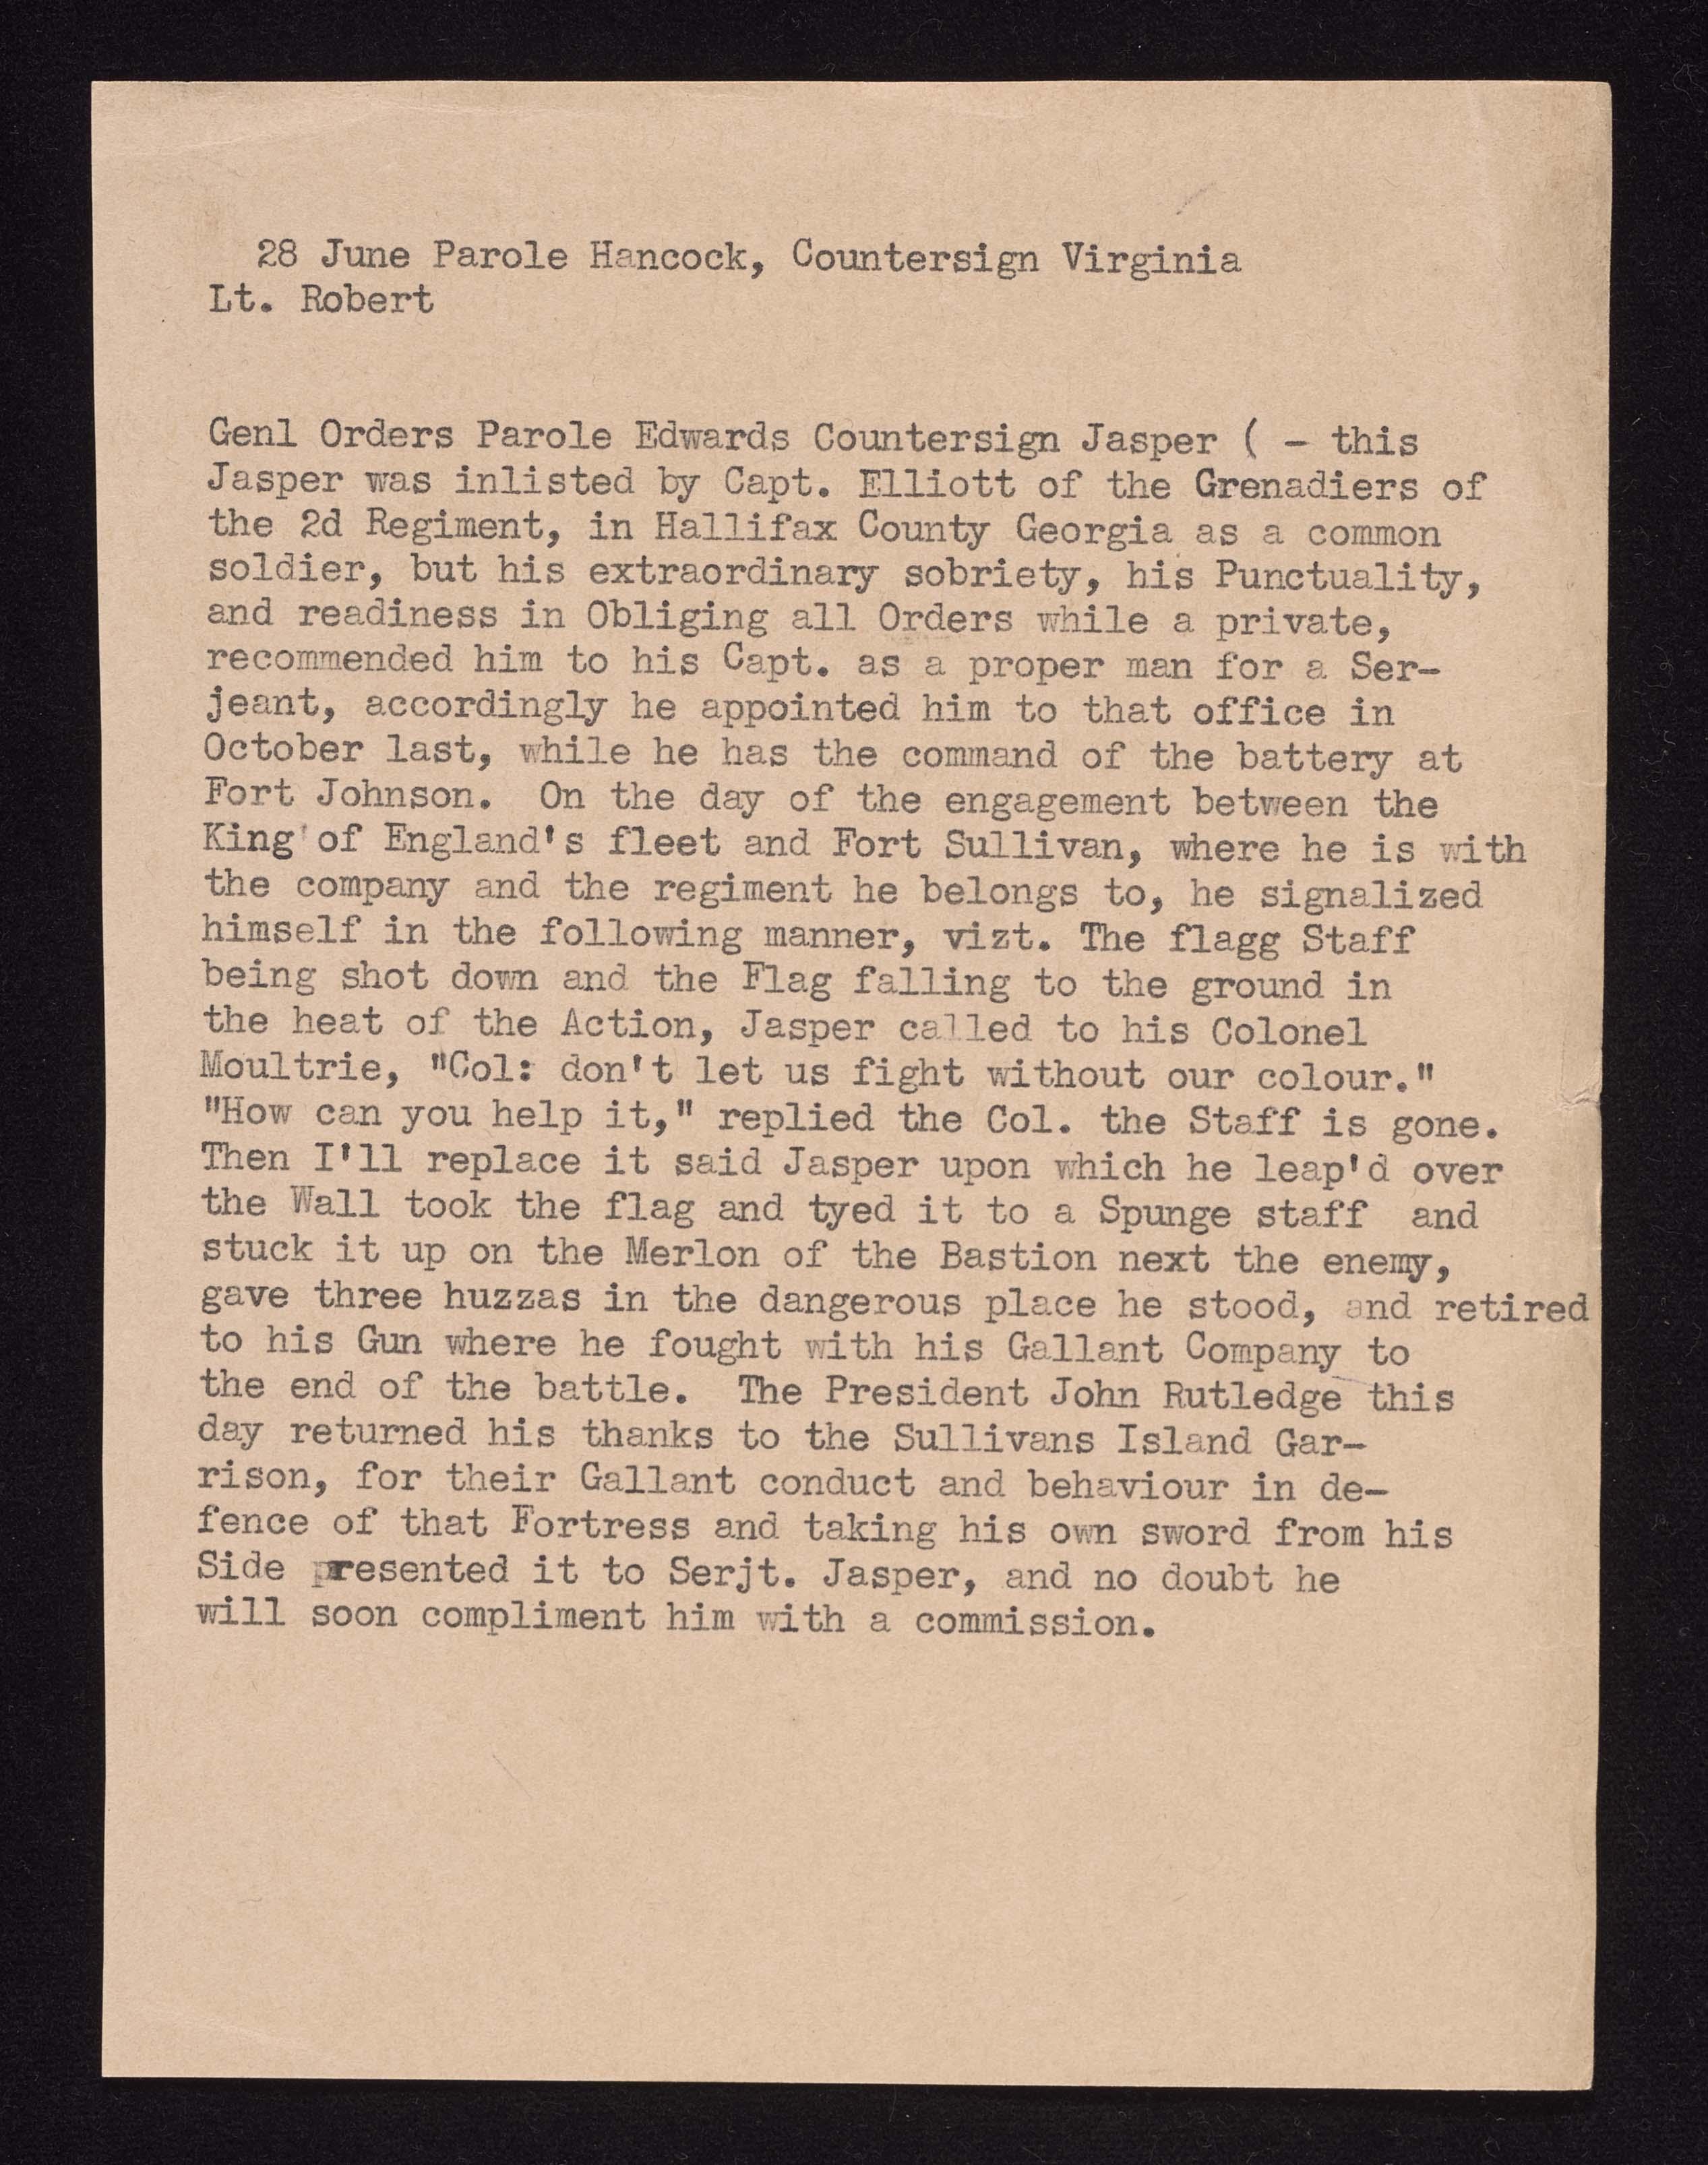 4th South Carolina Regiment Order Book, Insert